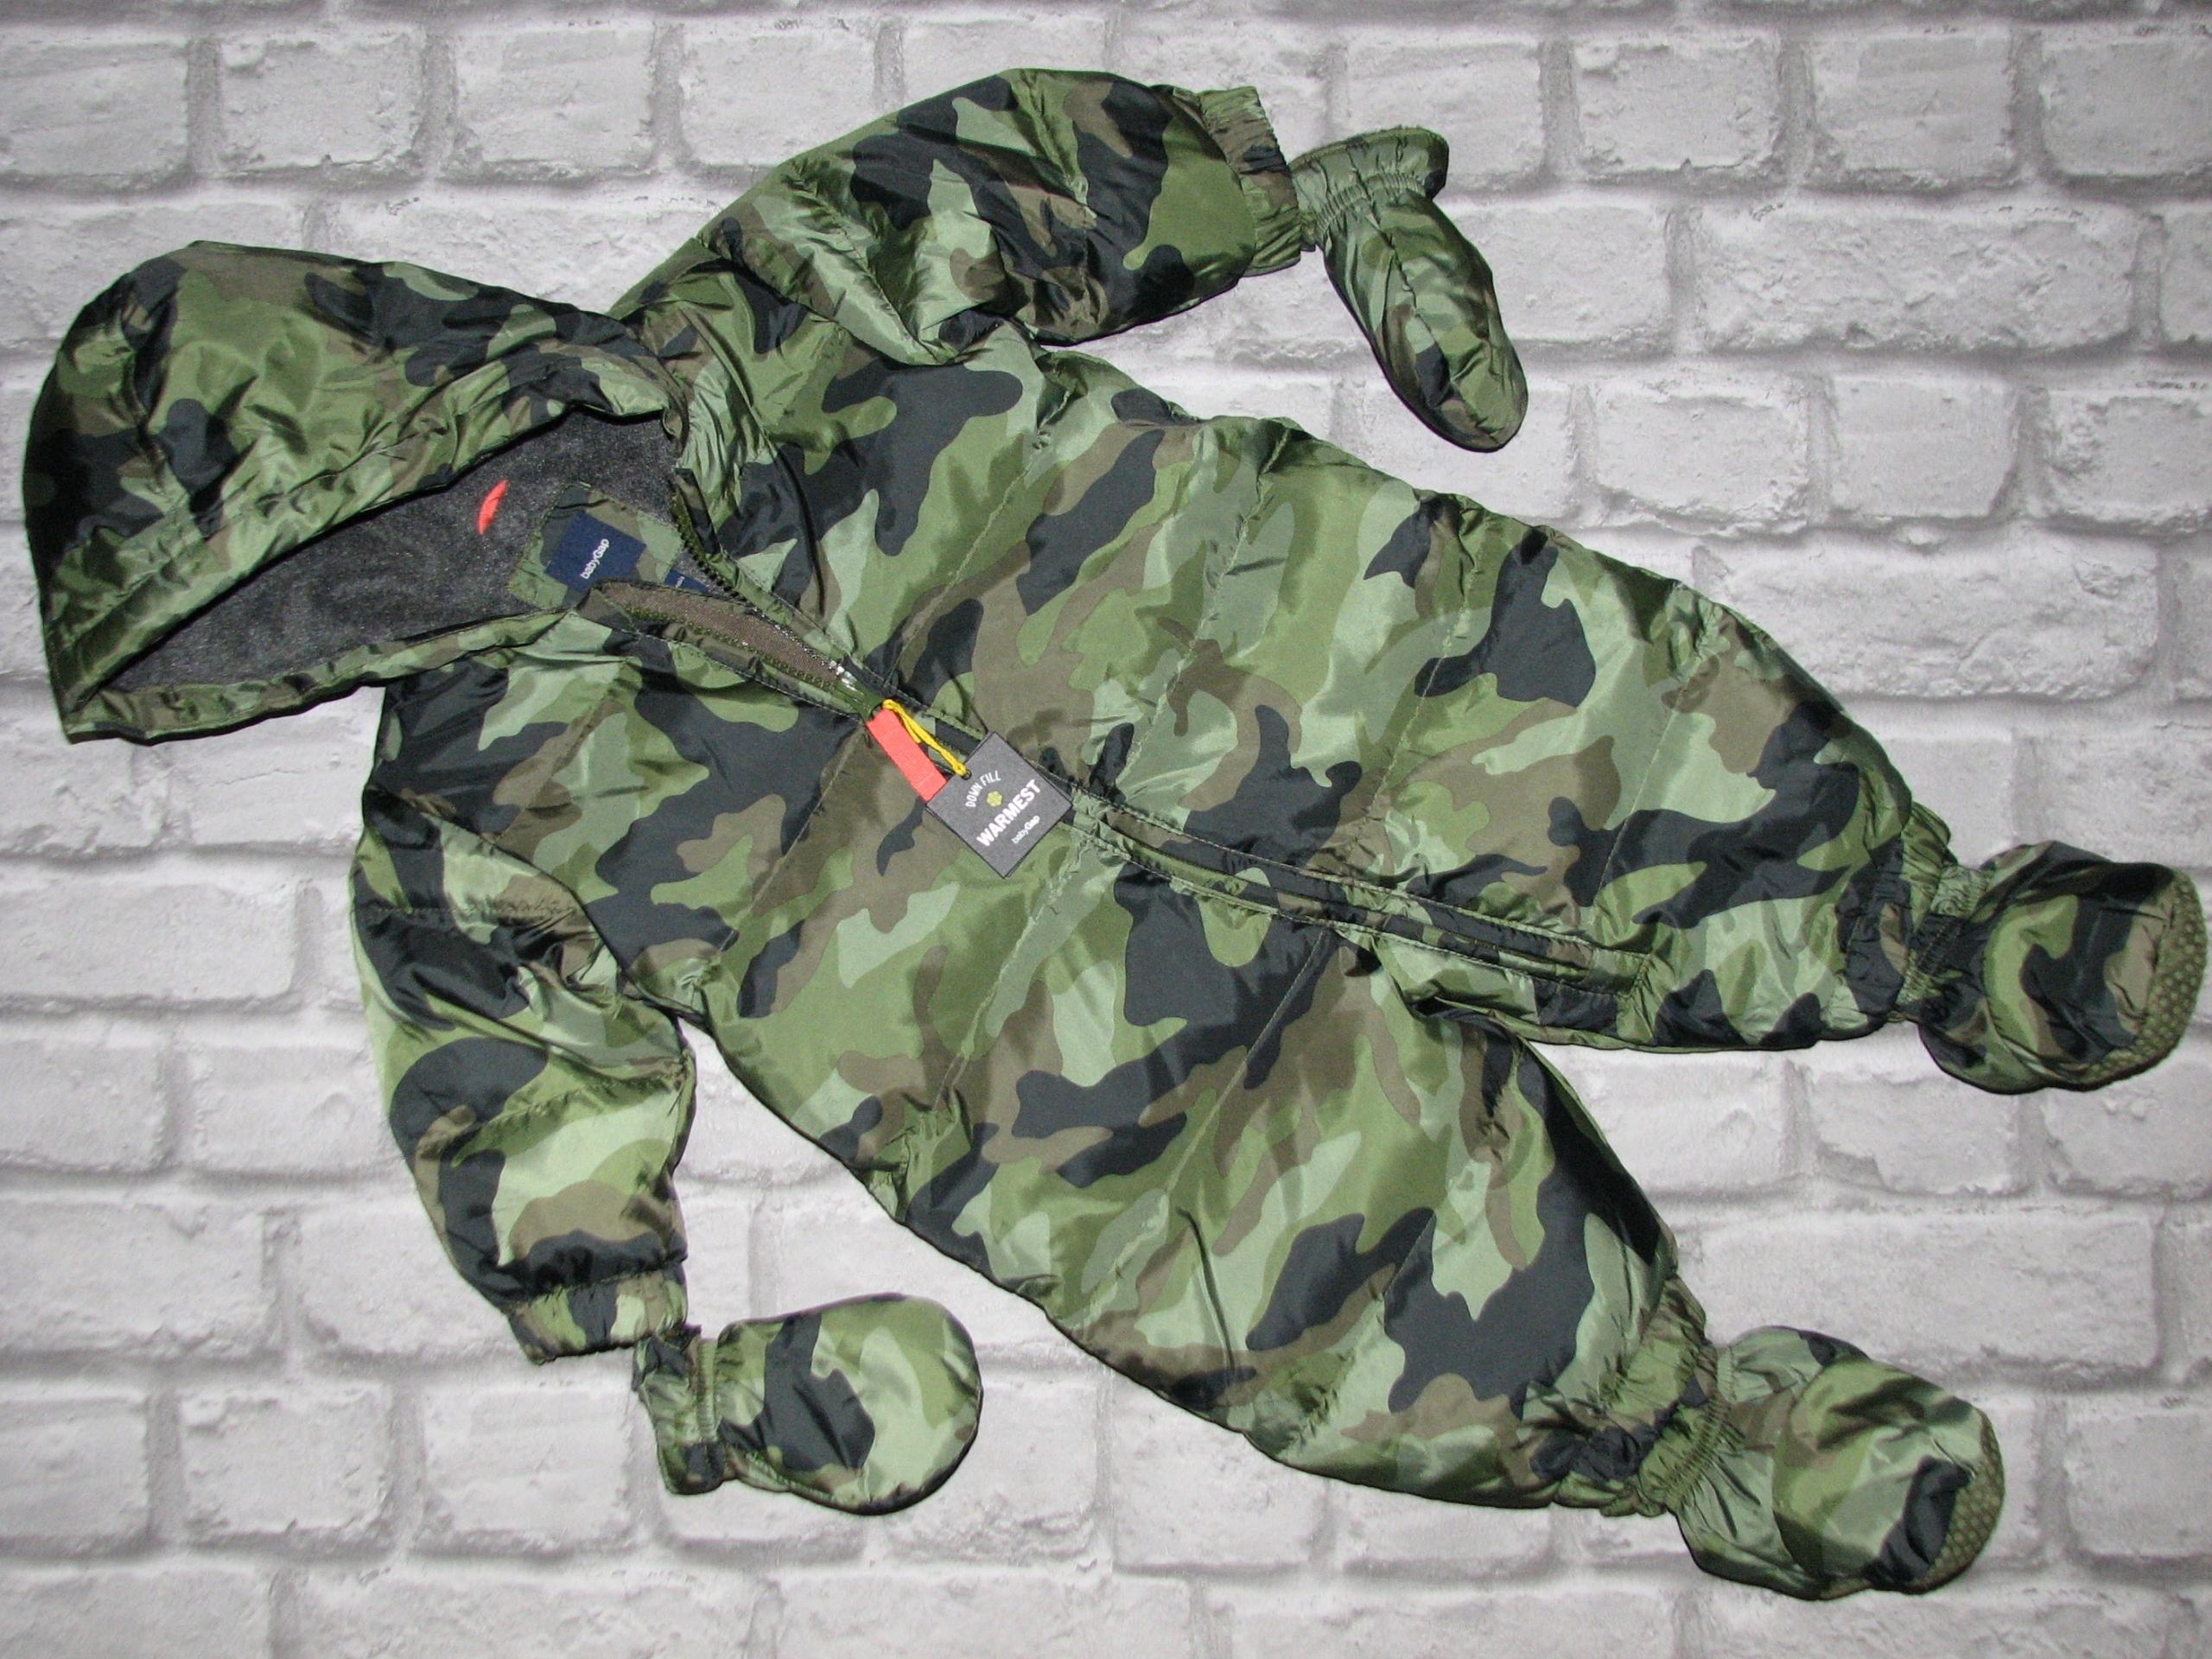 gap_zimowy dieťa jumpsuit 0-9 puchowy_ m-cy_nowy